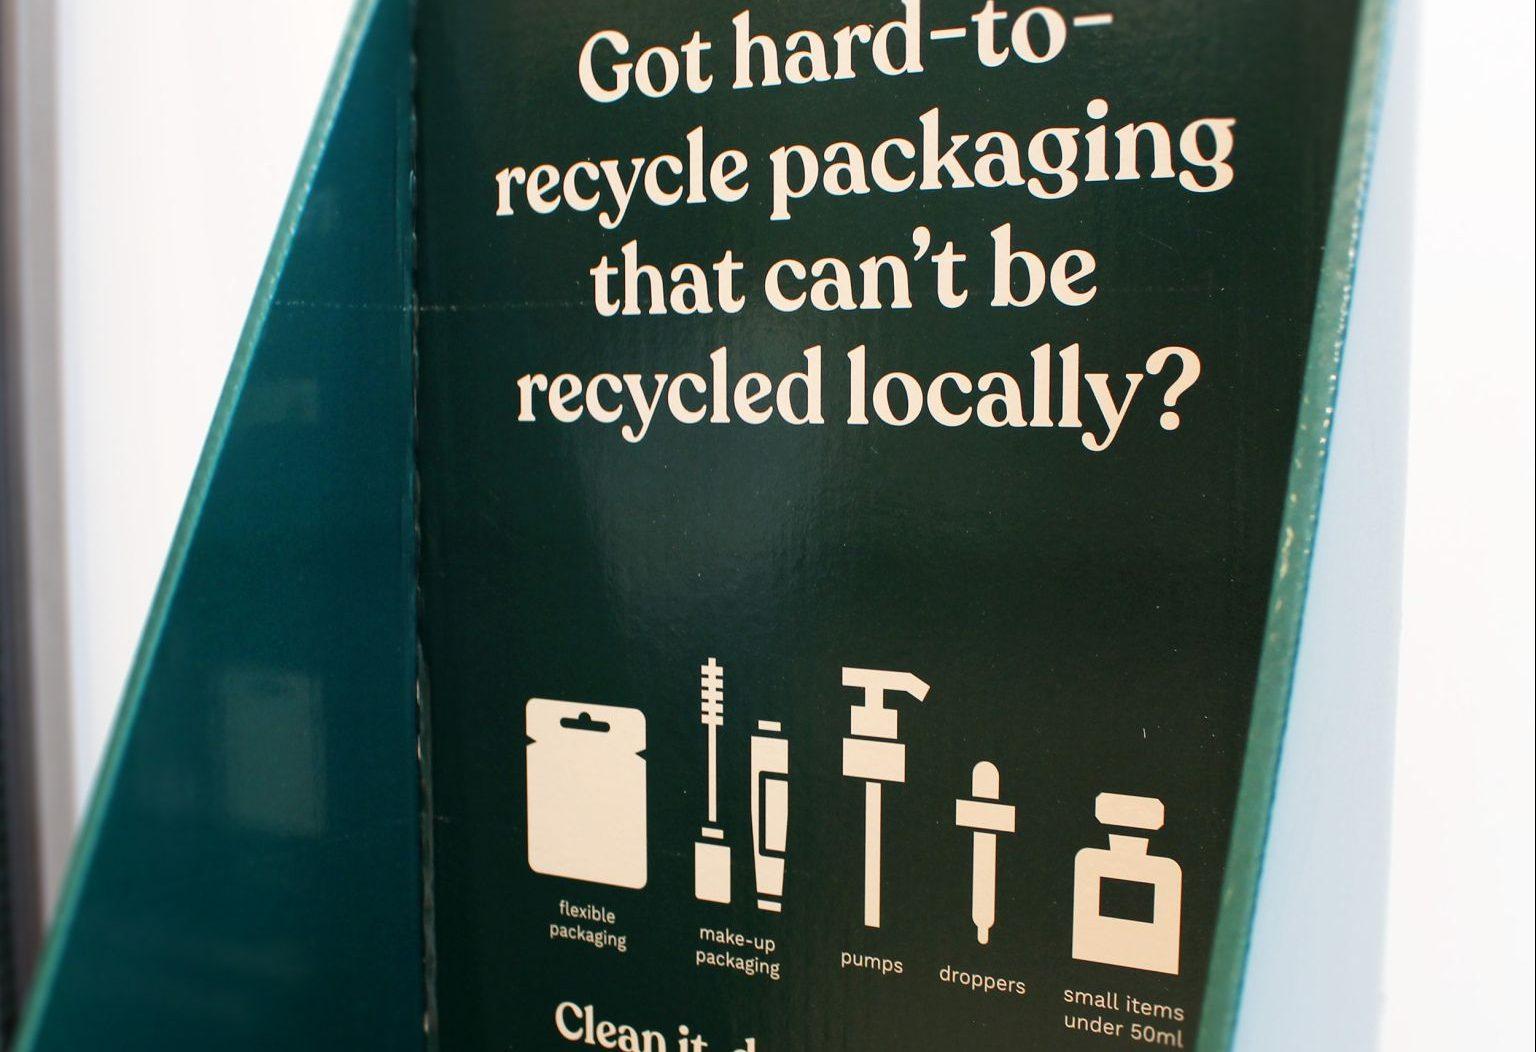 The Body Shop 在英国门店启动产品包装回收利用项目